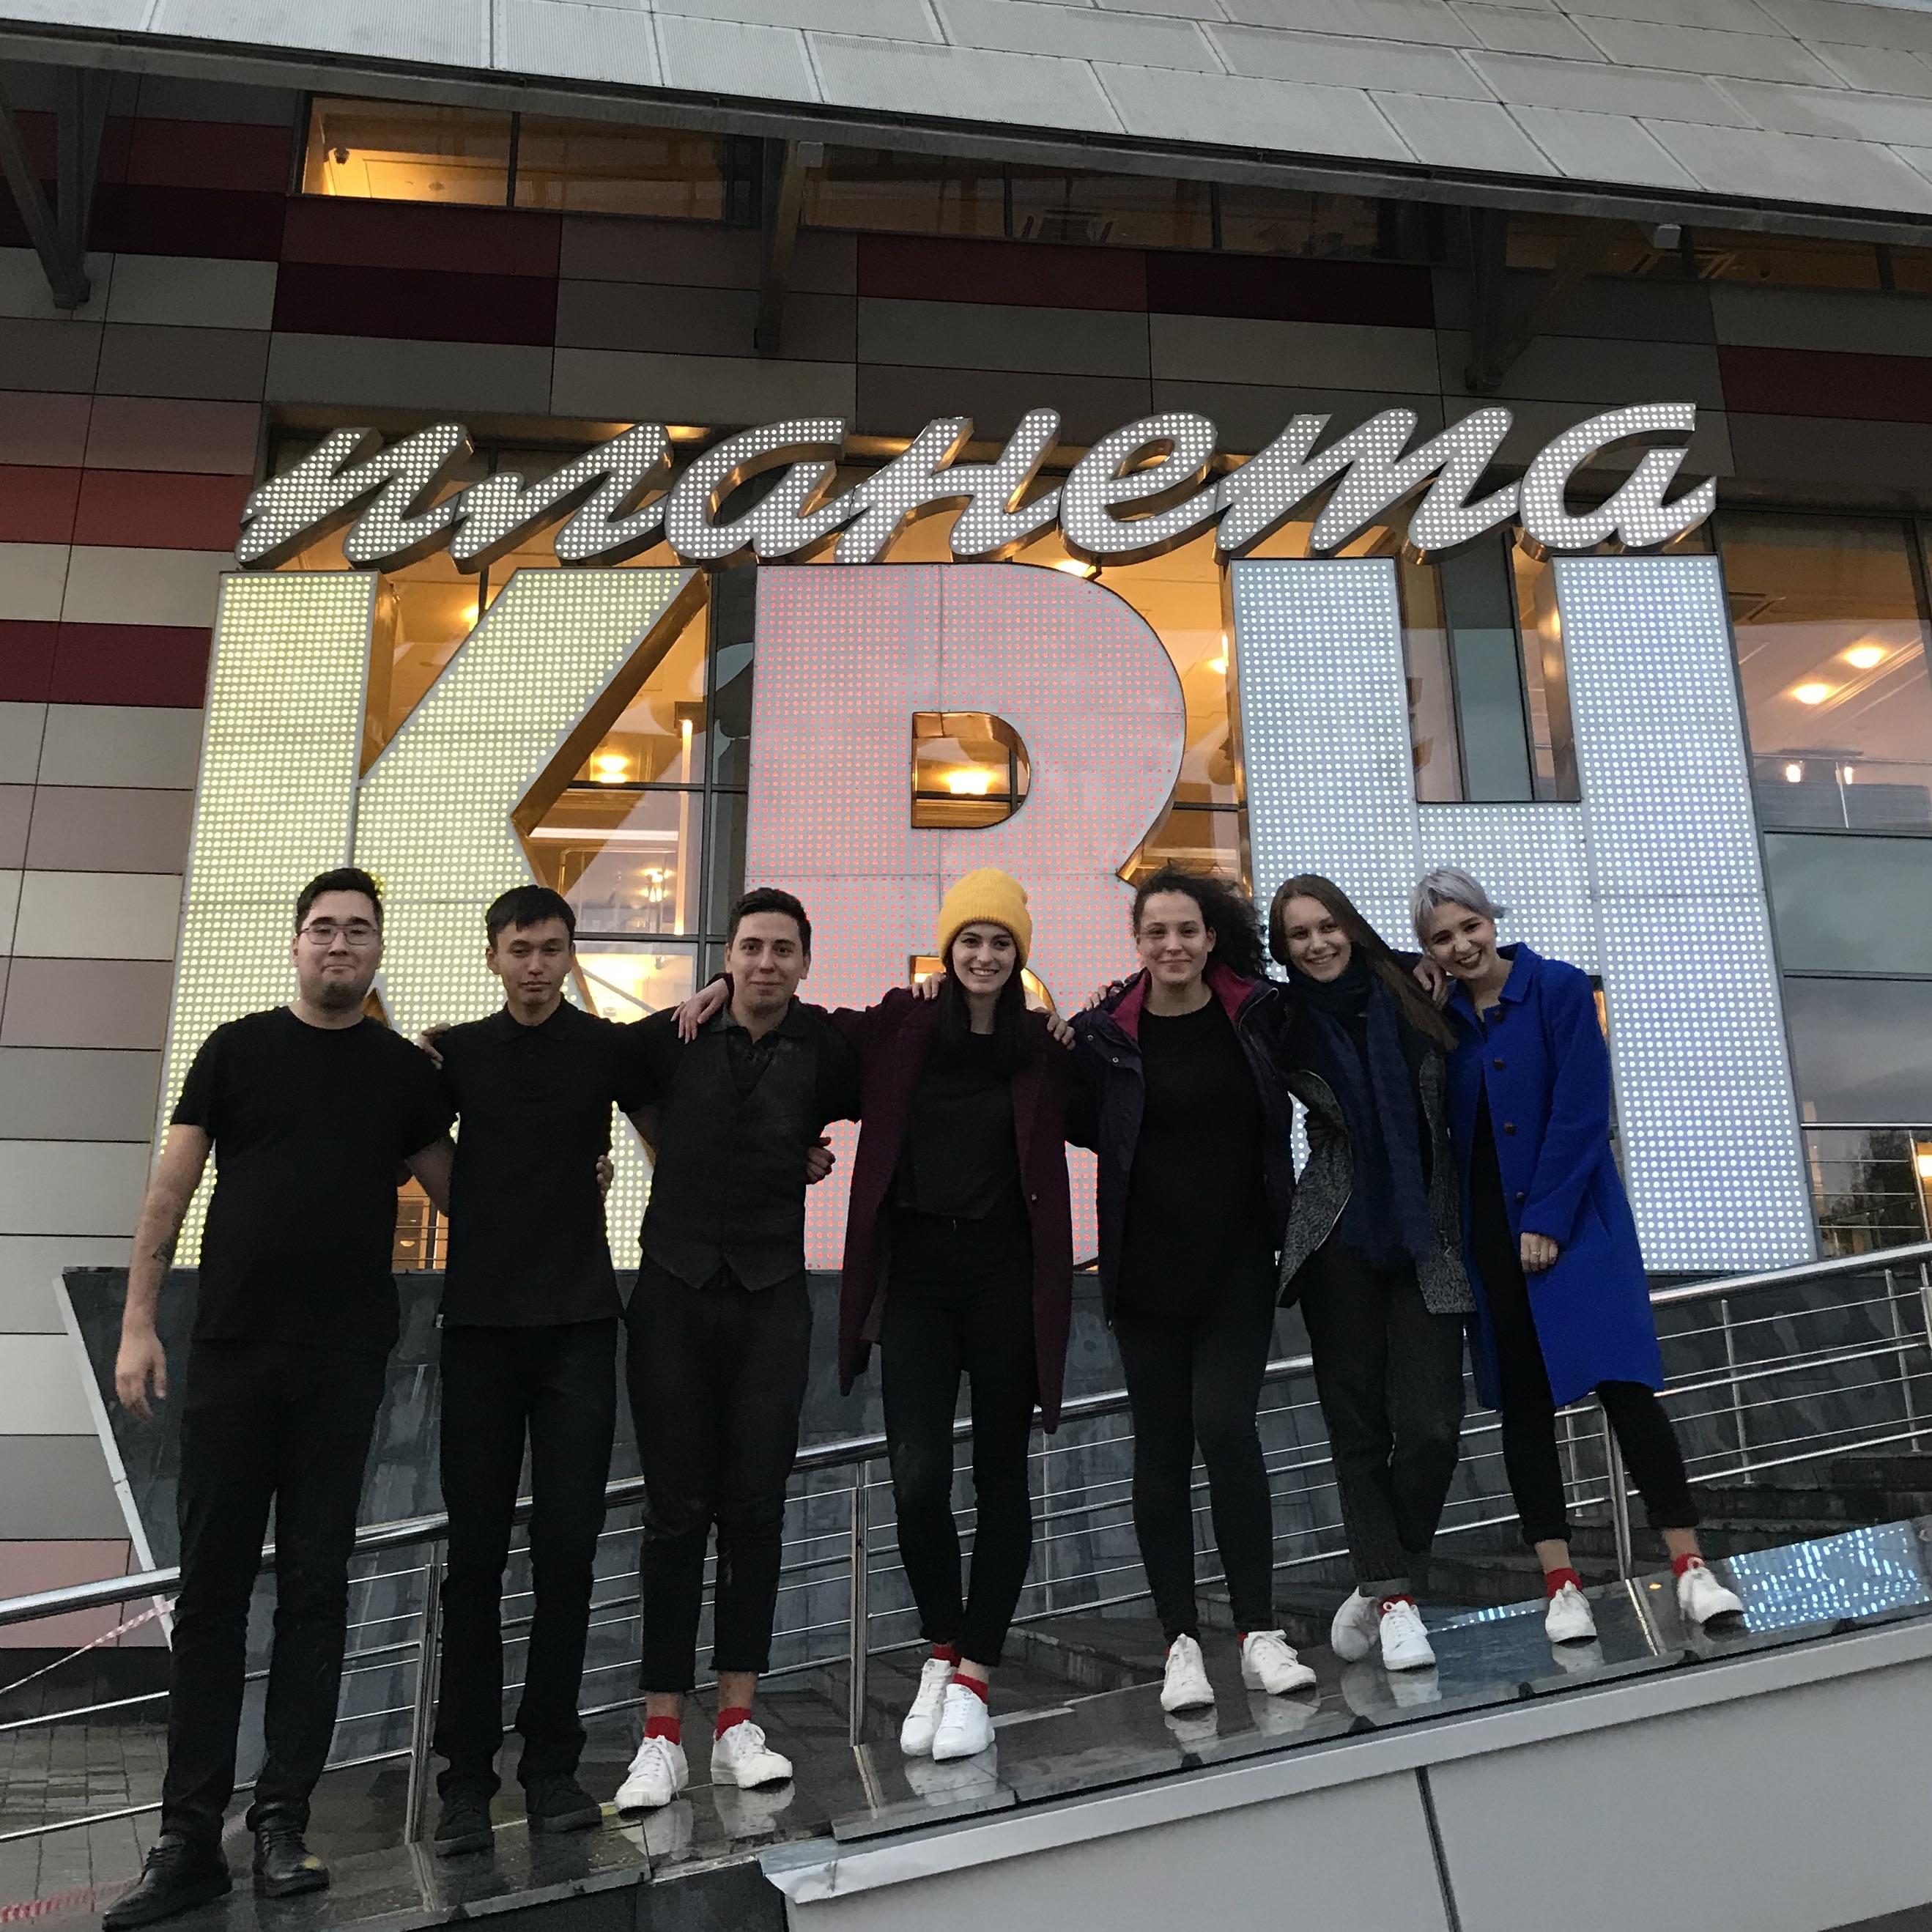 Команда КВН «Ха-Ха Ленд»